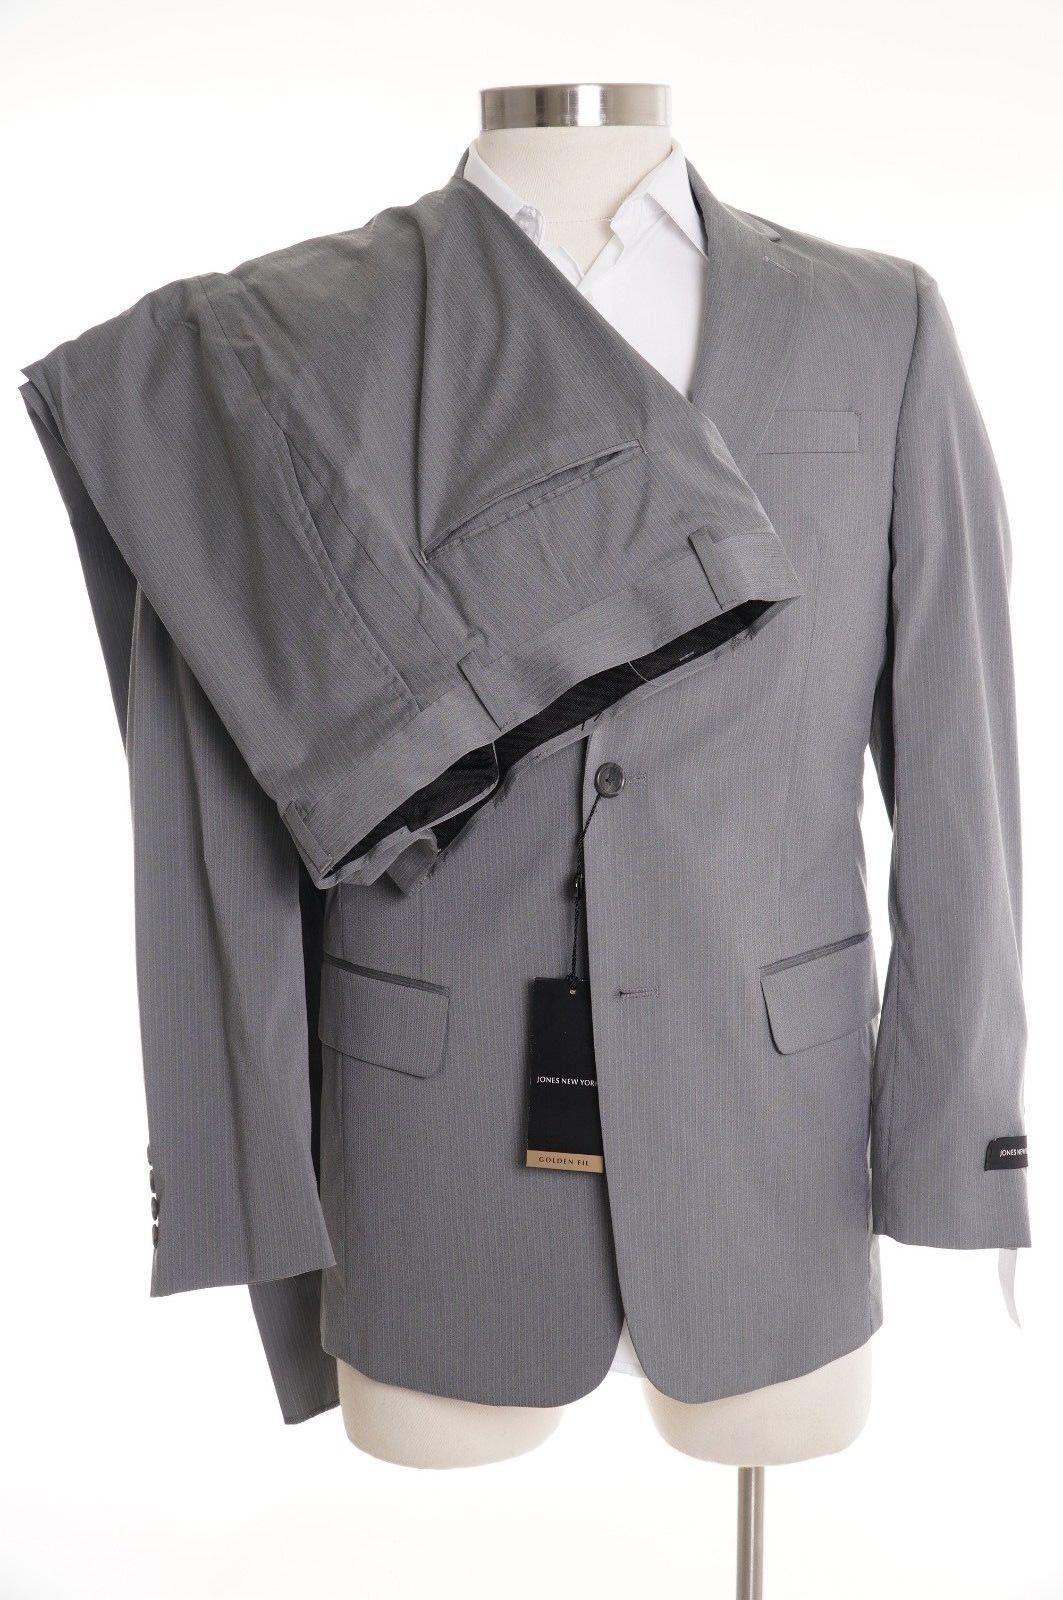 650 Jones New York Classic Fit grau TextuROT Two Button Suit 38R 31.5W